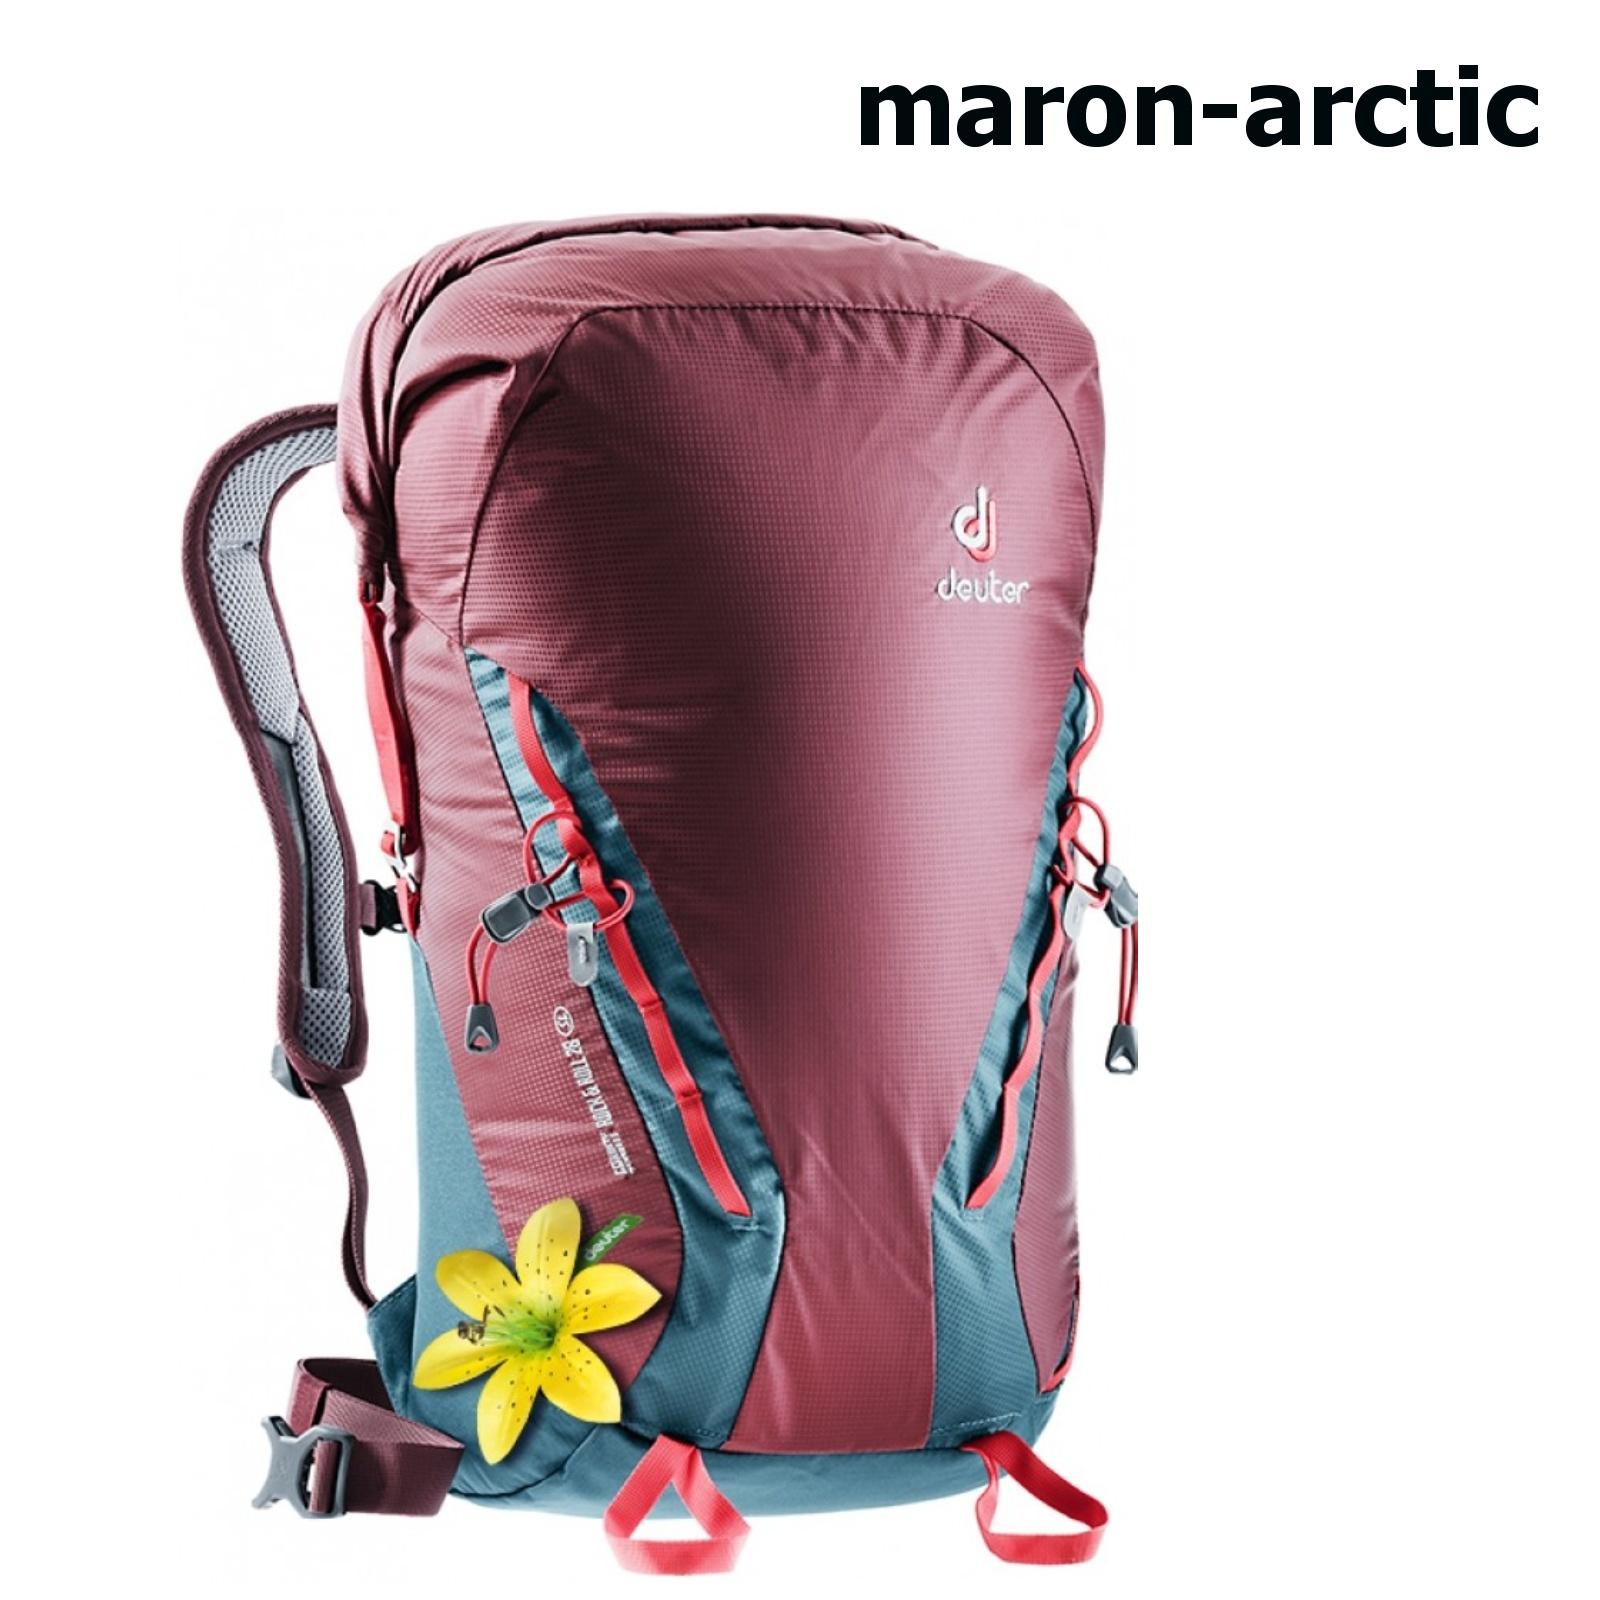 Deuter Gravity Rock&Roll 28 SL maron arctic